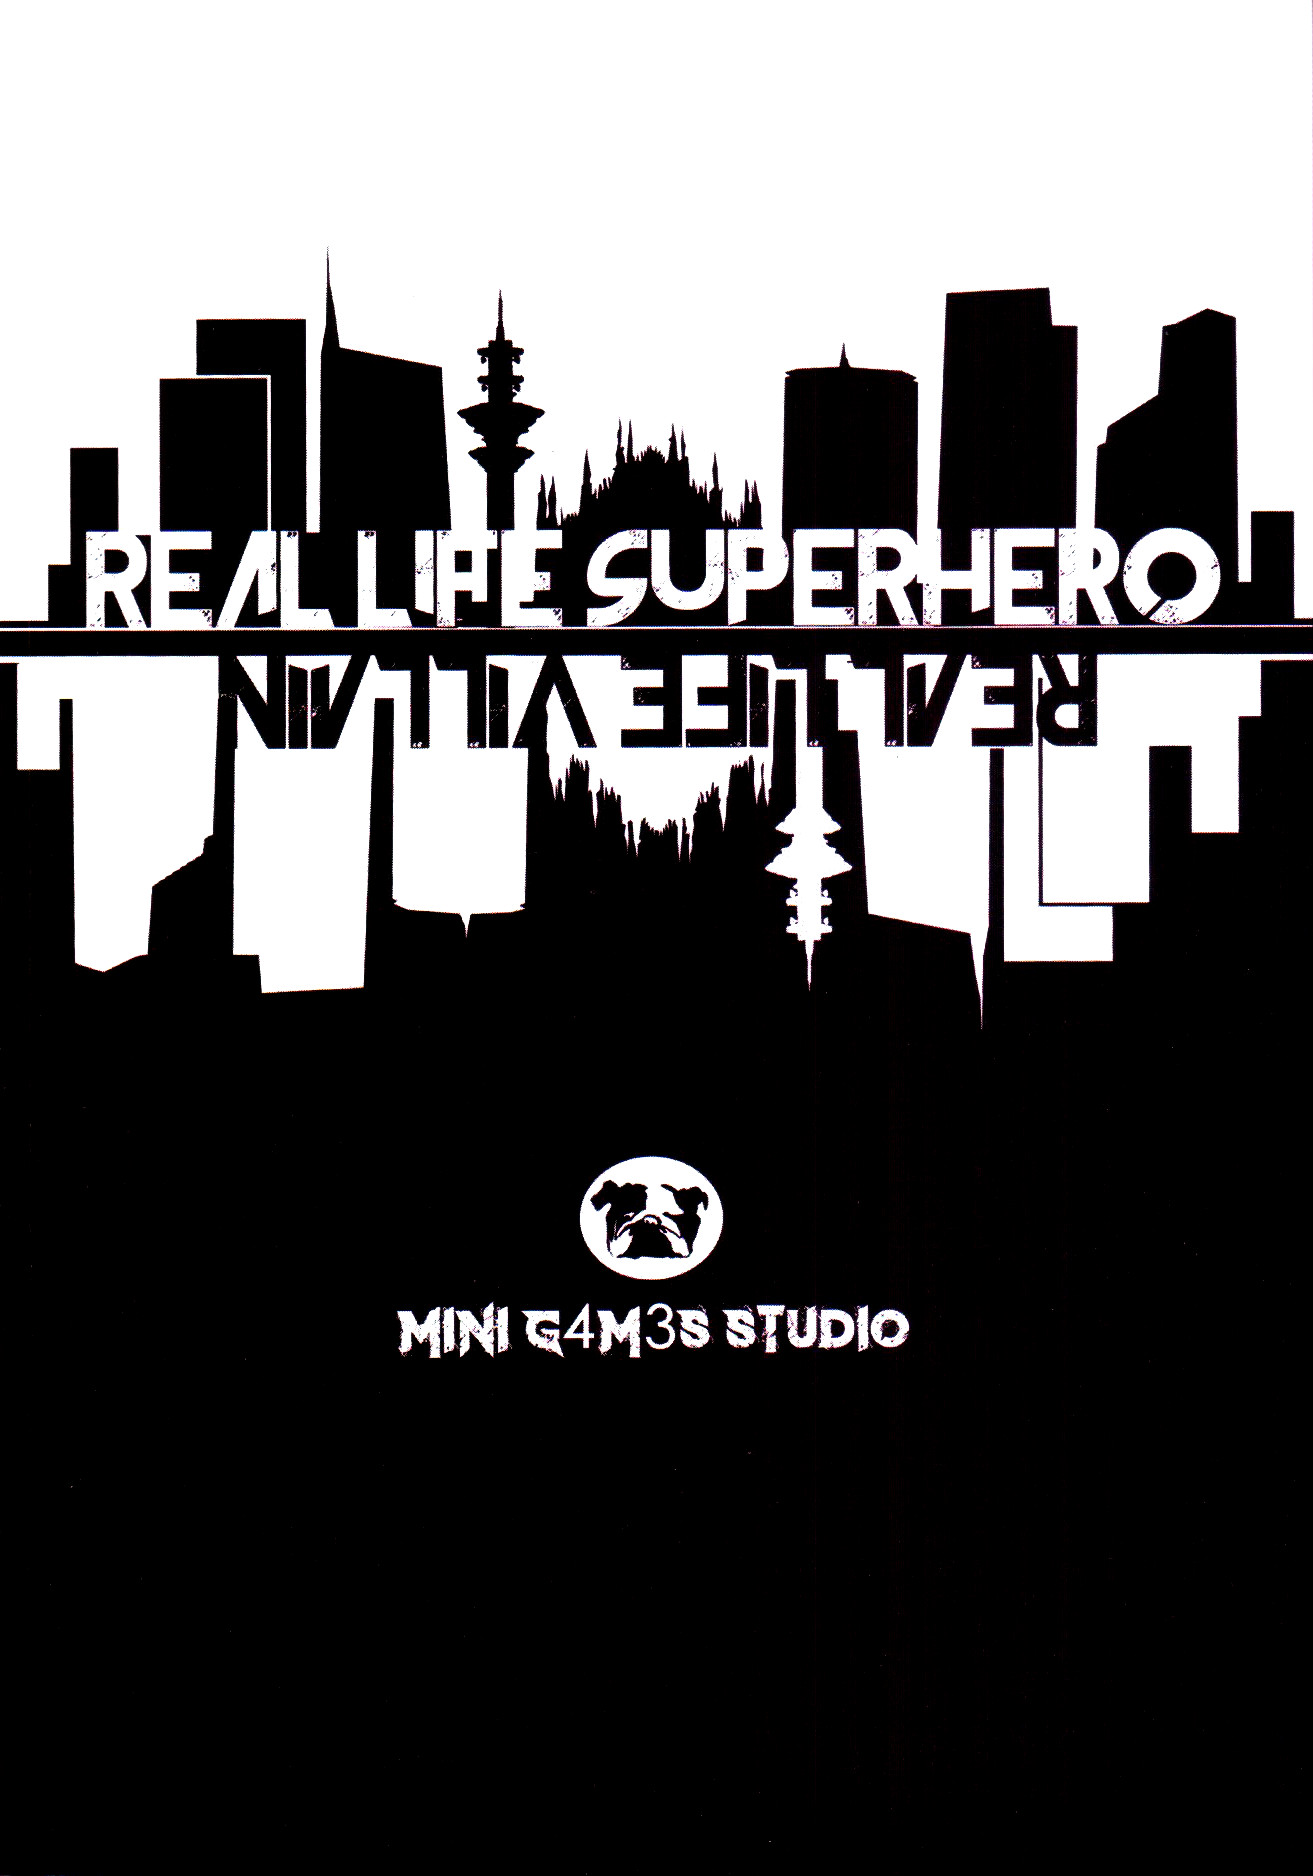 Real Life Superhero/Real Life Villain